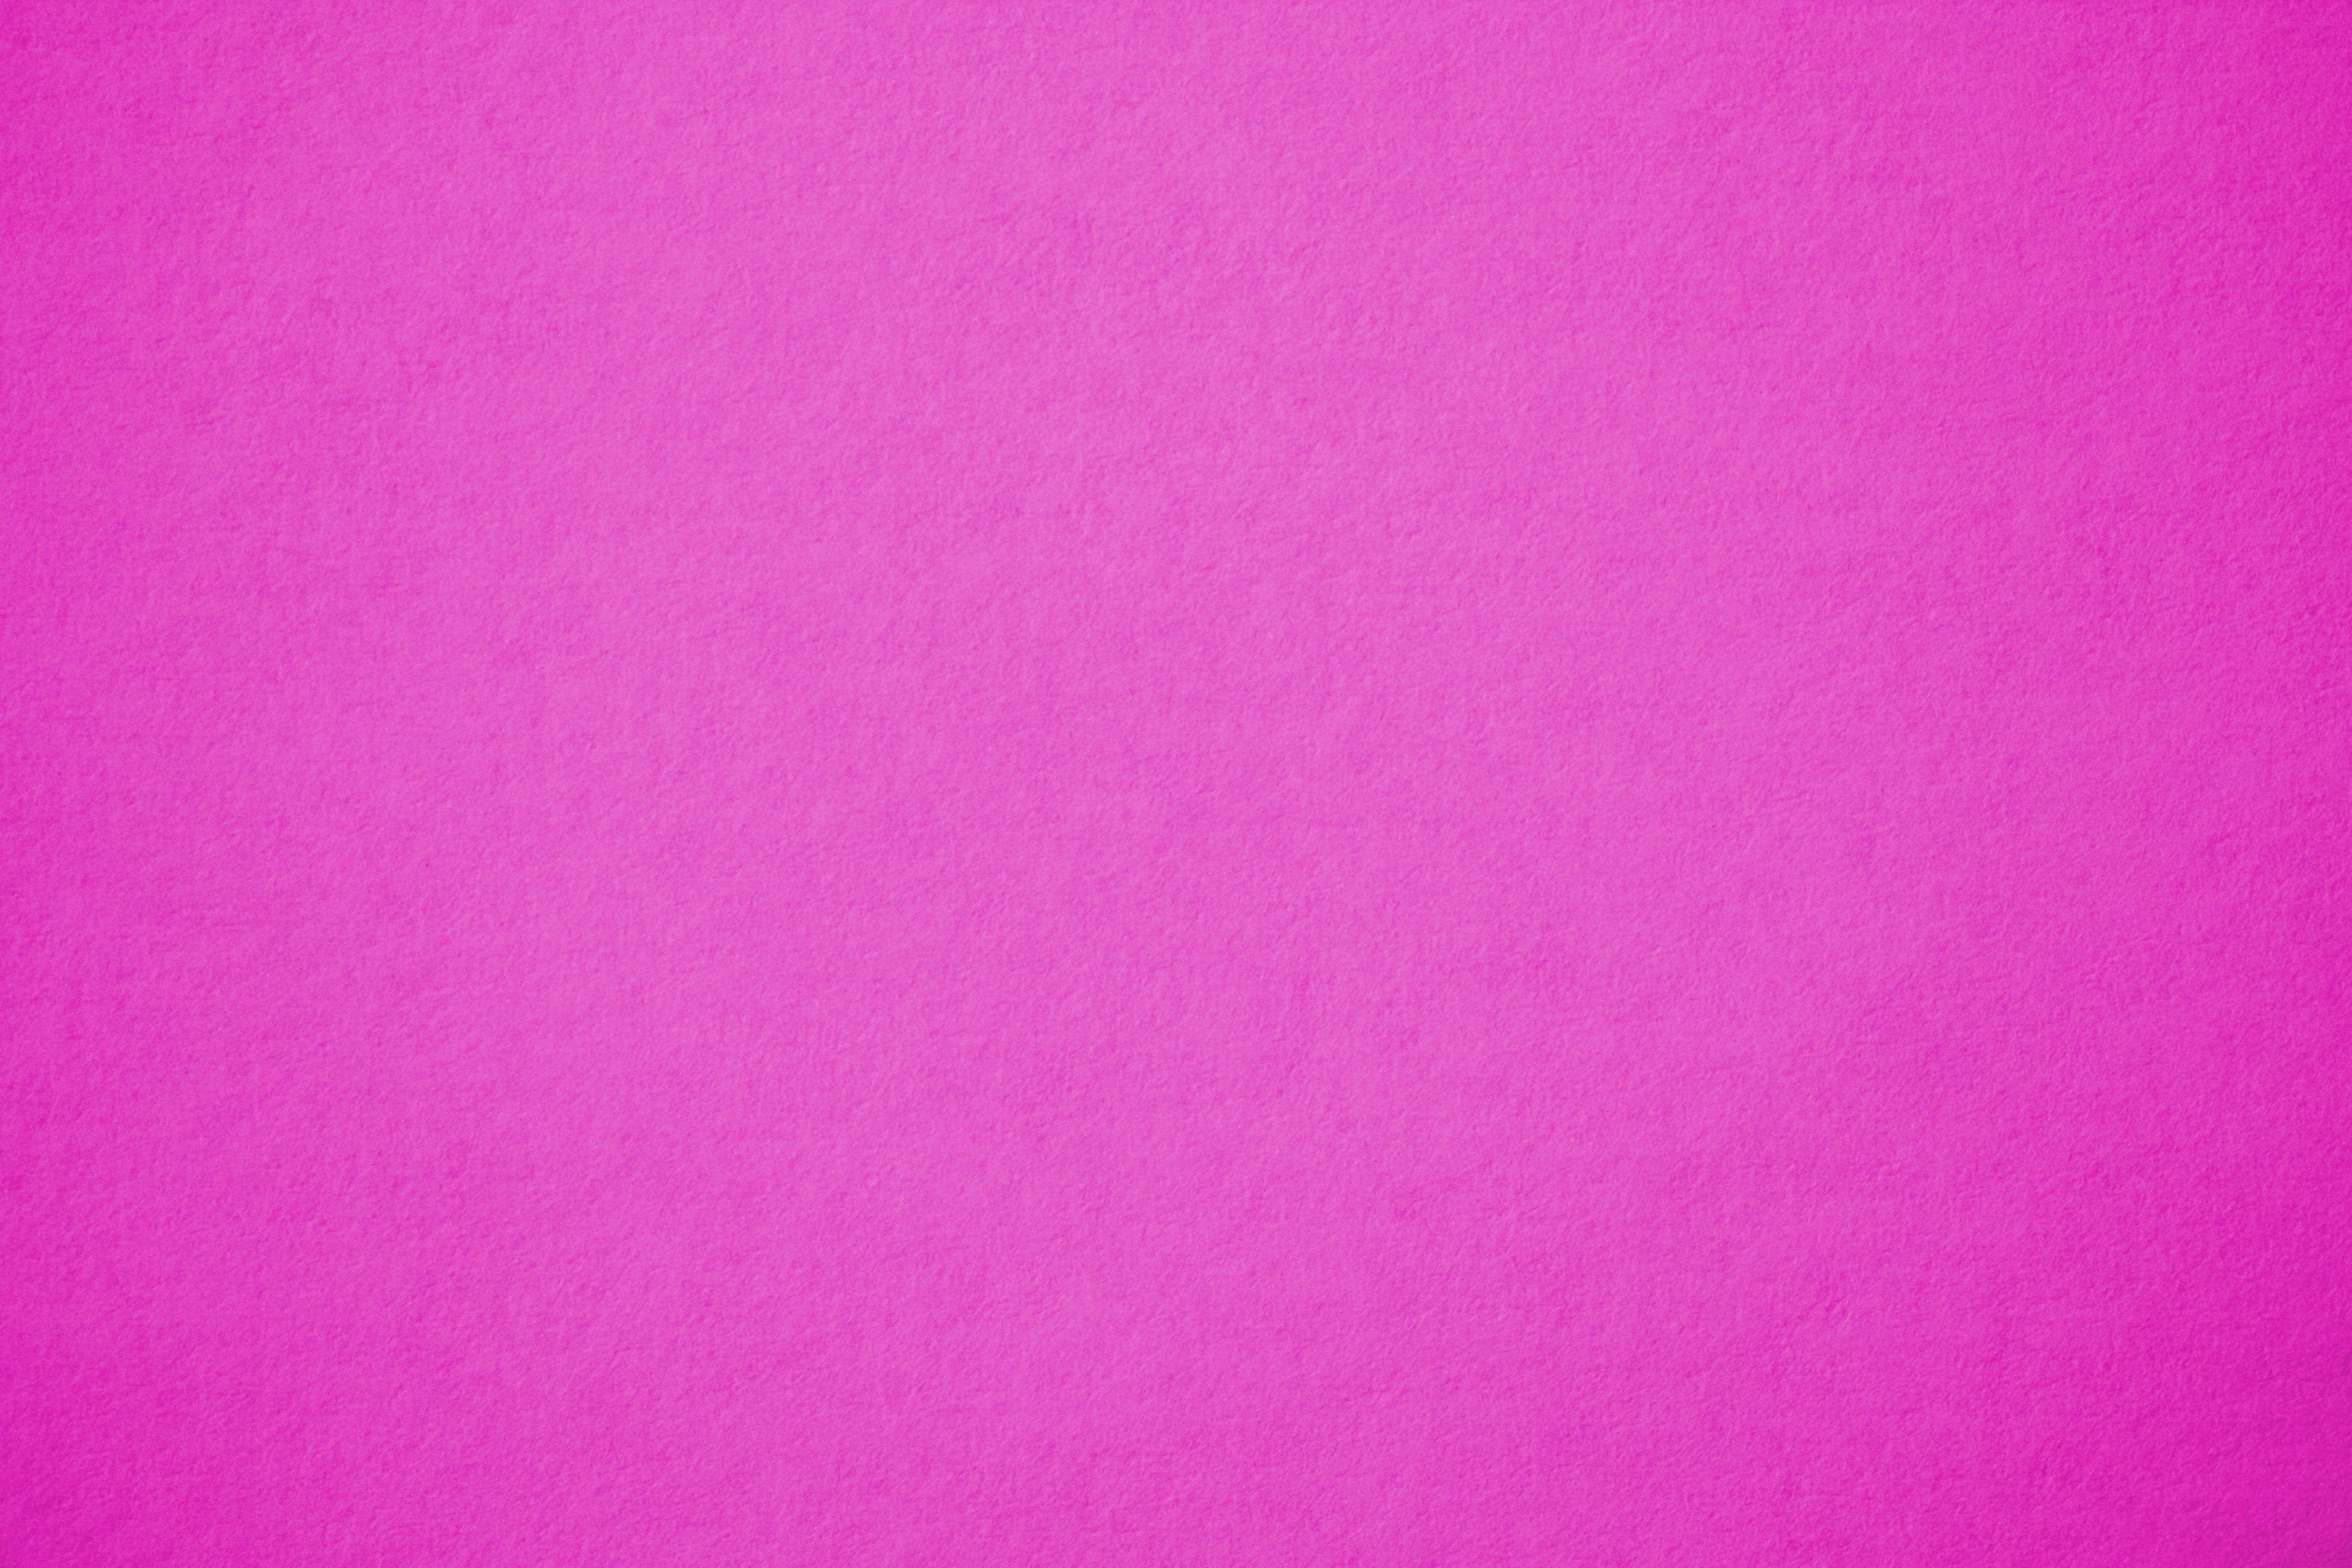 Download 6600 Background Ungu Pink Terbaik